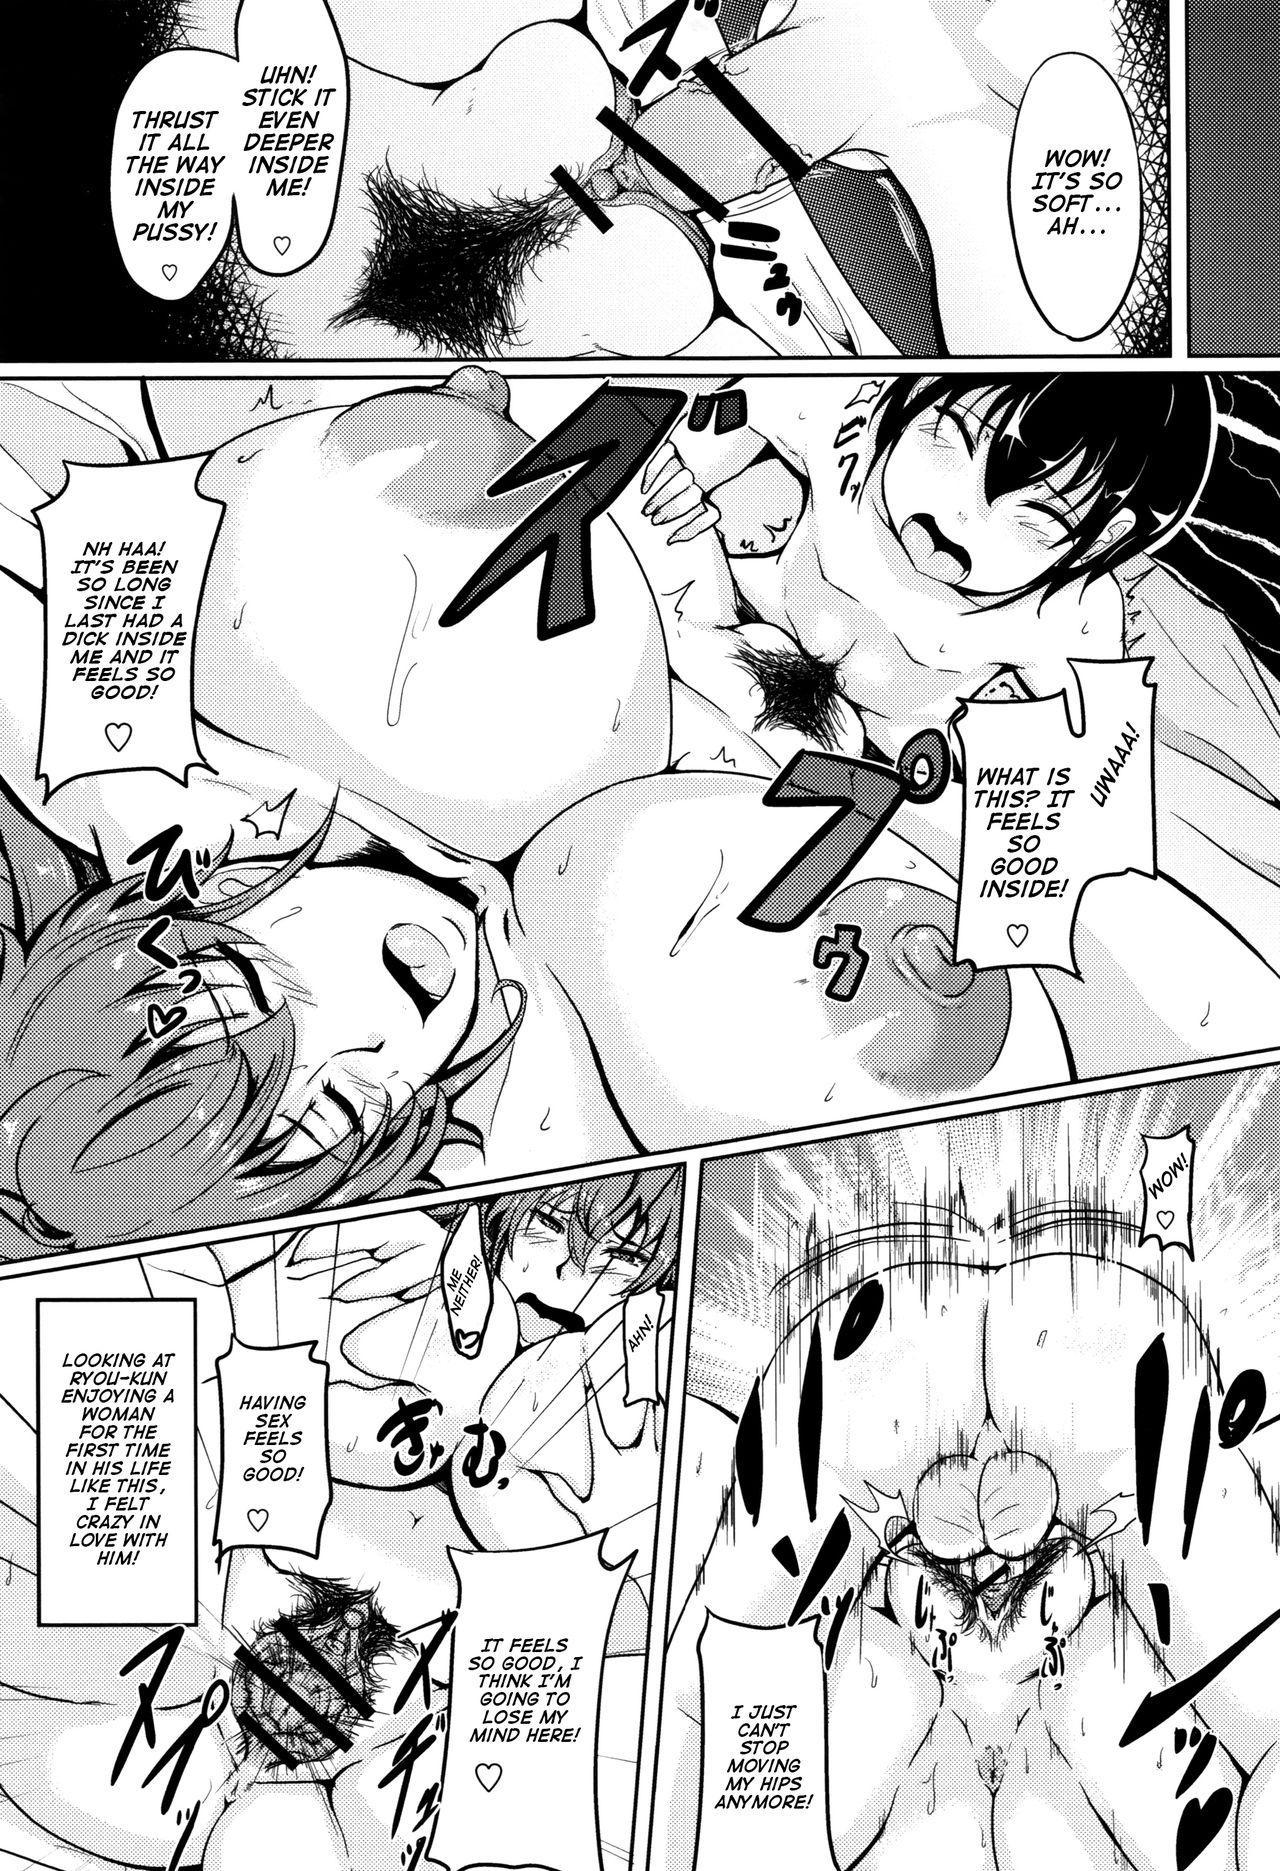 Ikenai Tomohaha | Dirty Mother of a Friend 14